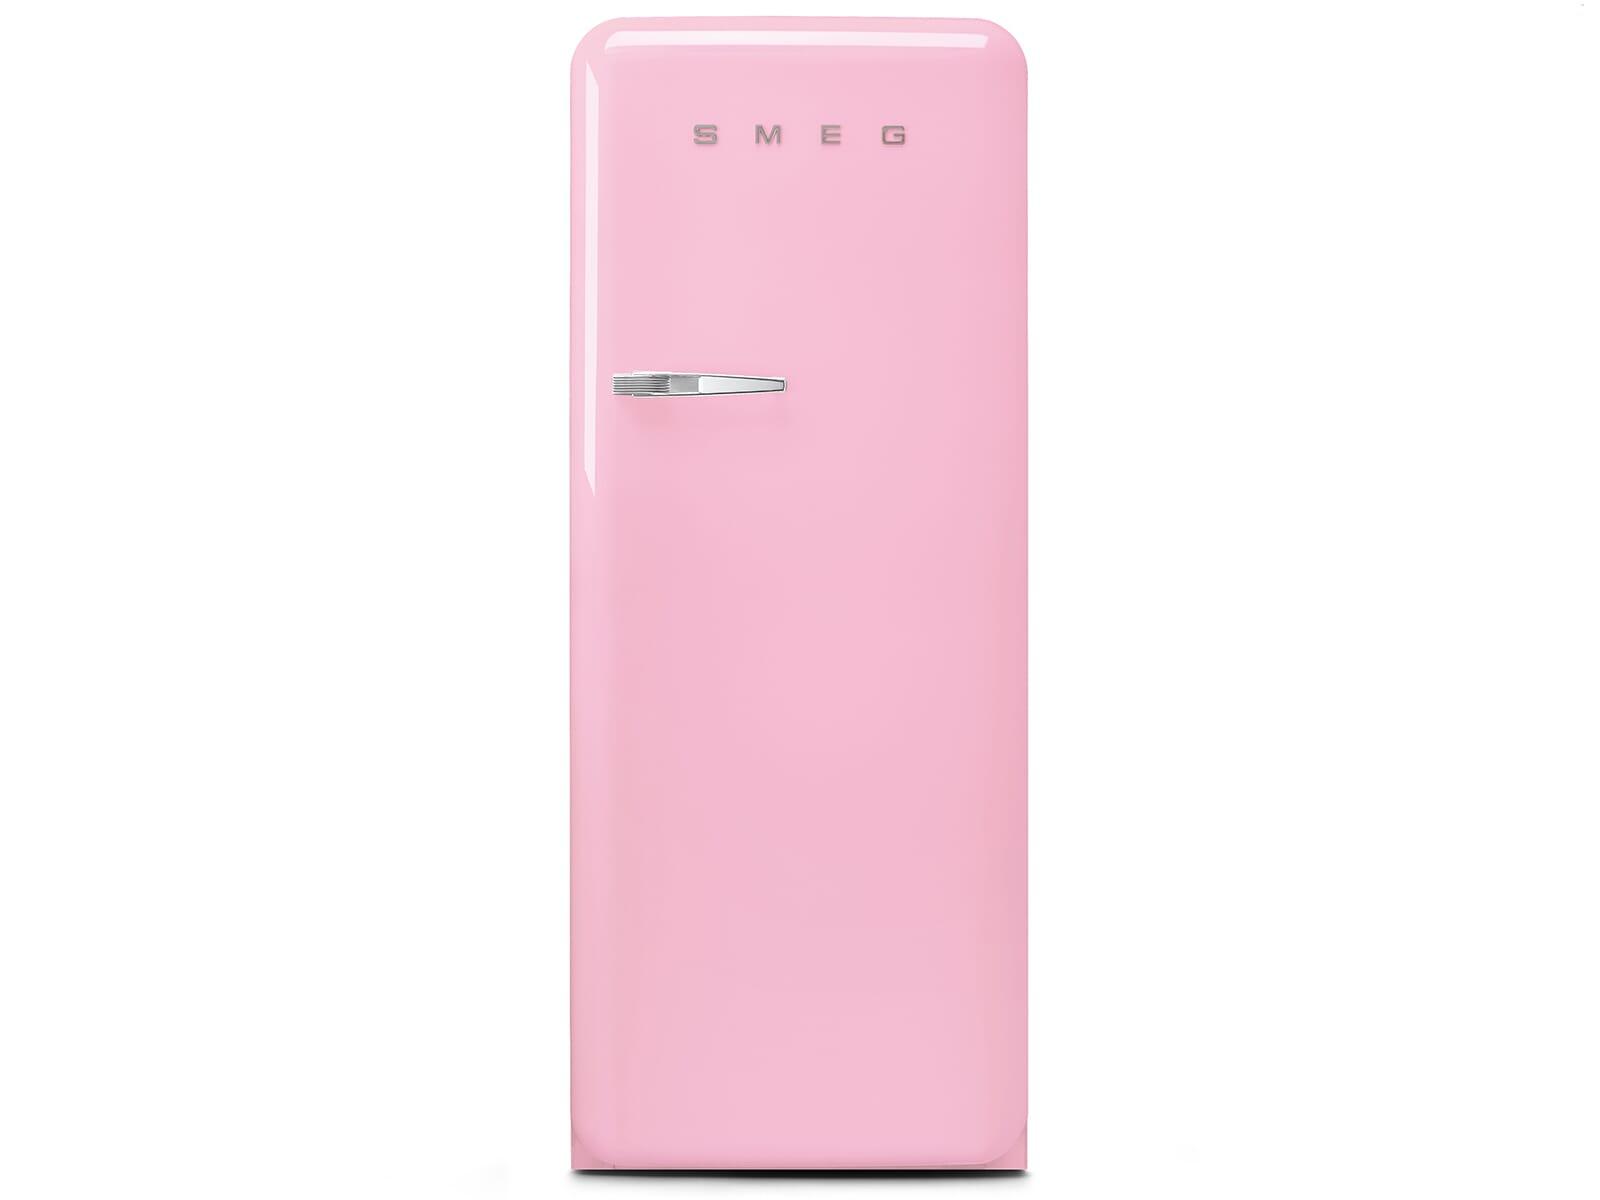 Side By Side Kühlschrank Pink : Smeg fab rpk standkühlschrank cadillac pink